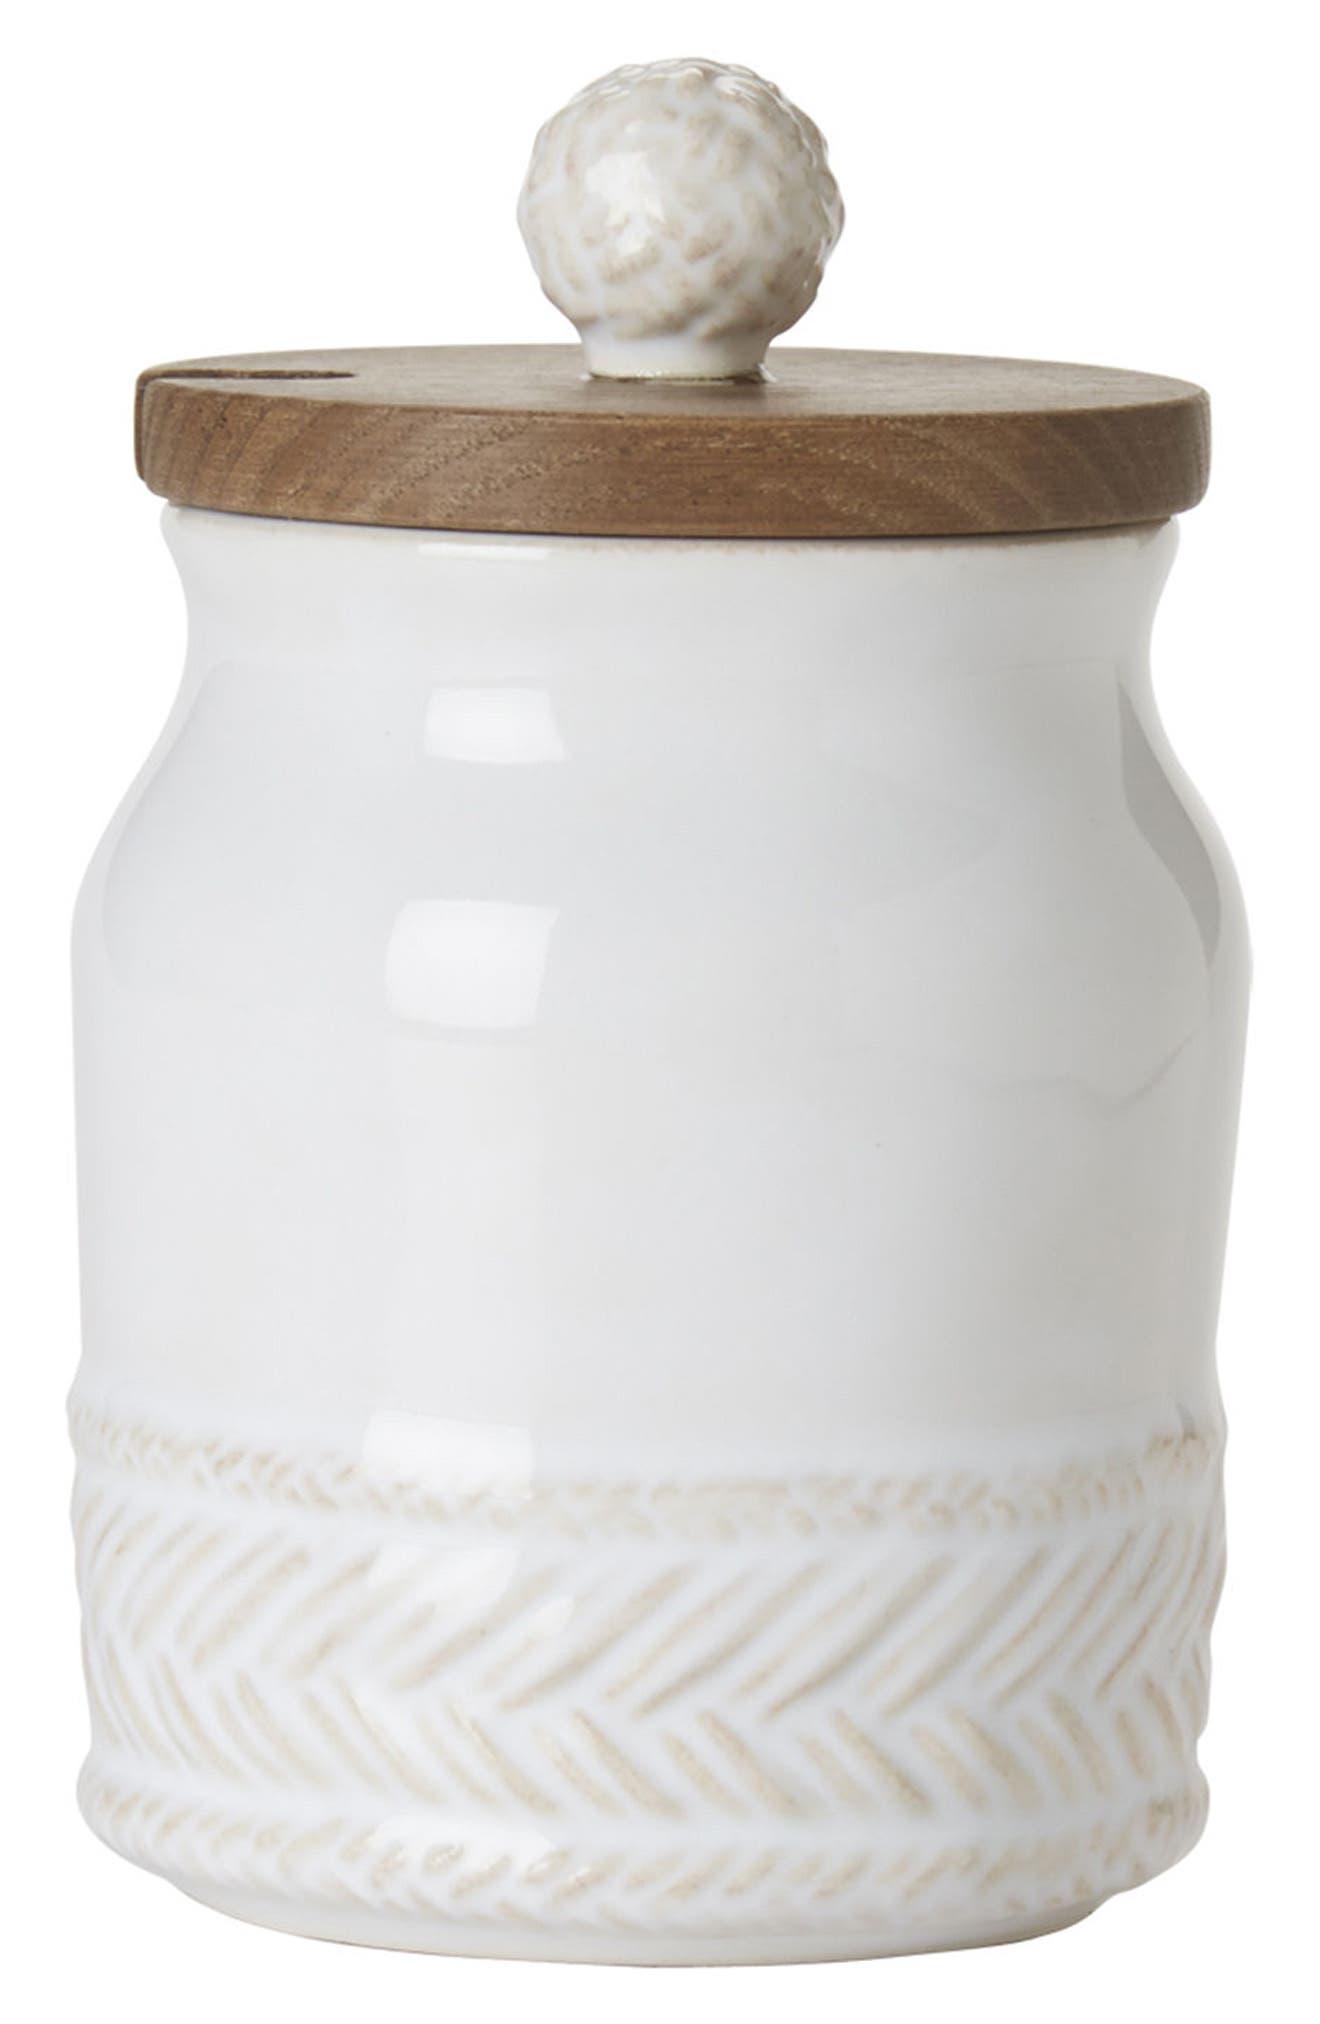 Juliska Le Panier Ceramic Sugar Pot